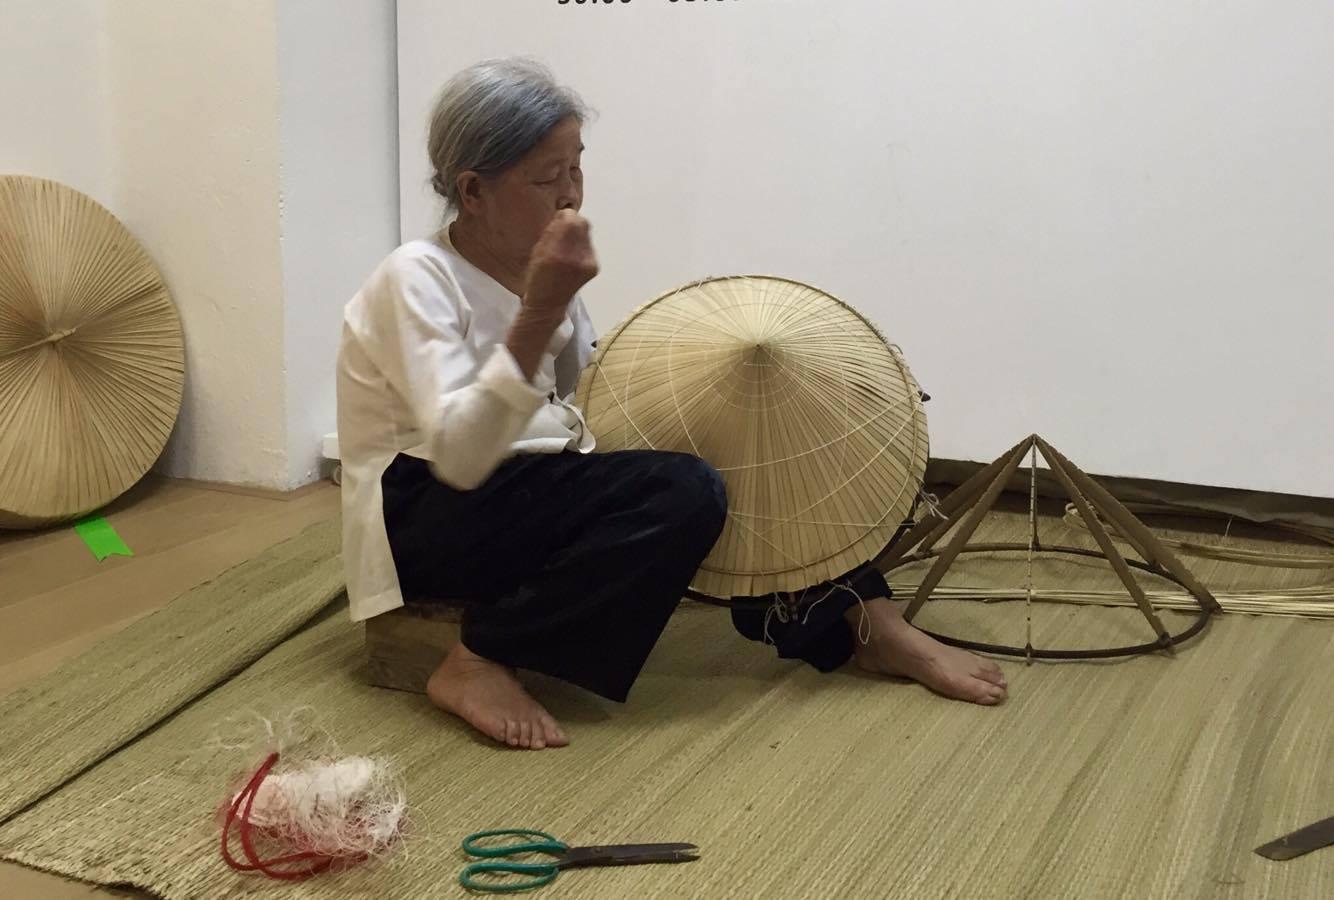 Tri Lễ - a village that makes traditional palm leaf hats